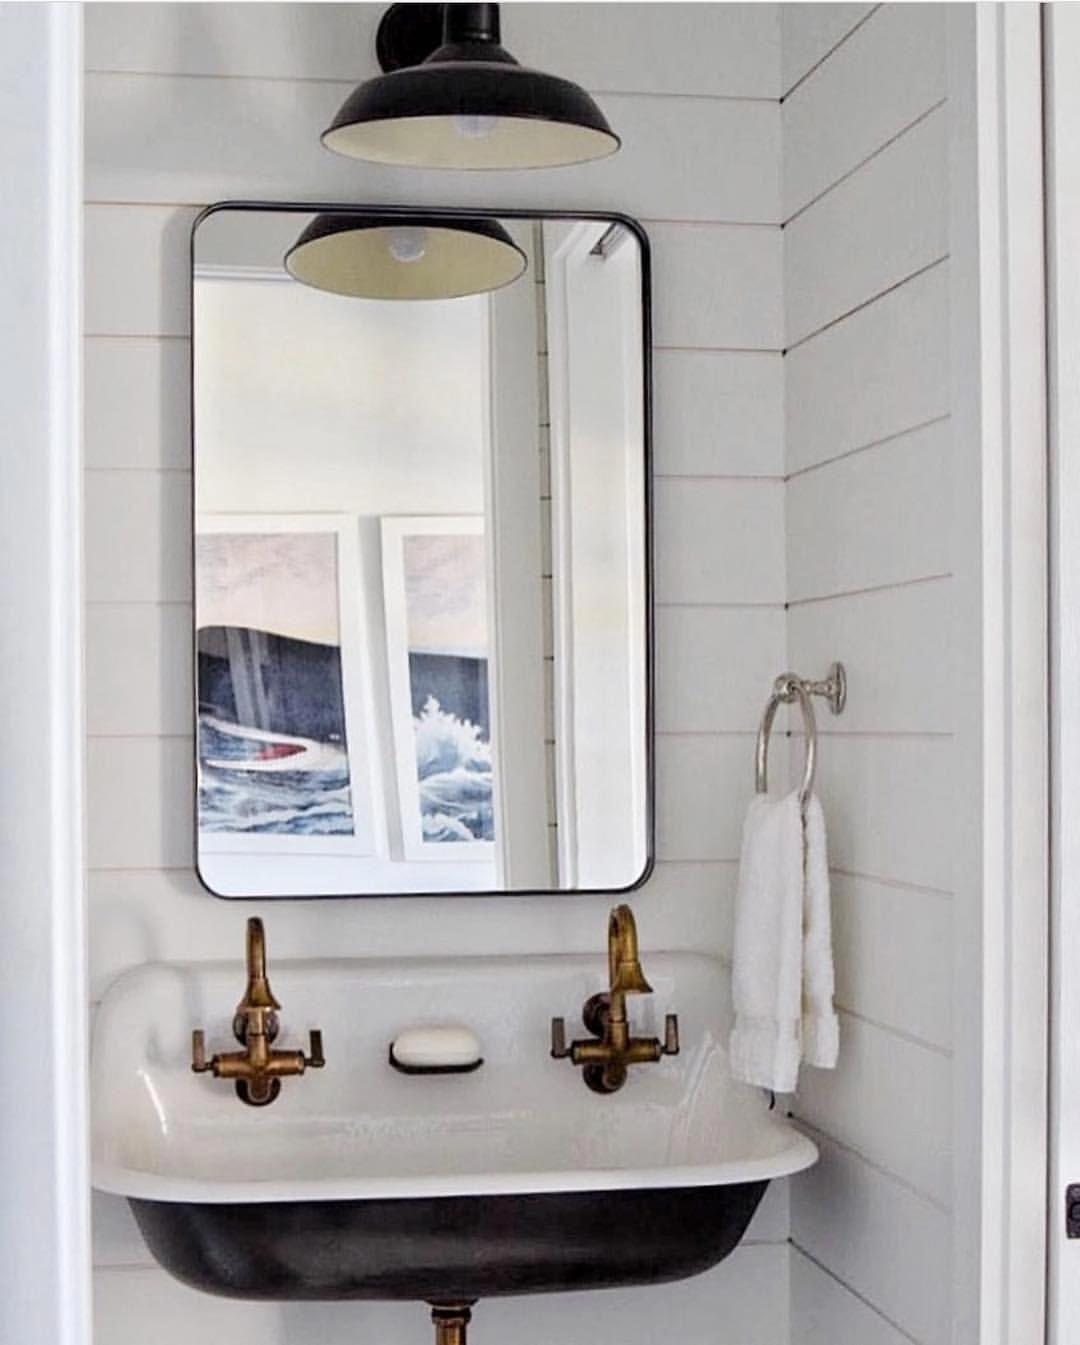 Washbasin Wallpaper 60 Small Modern Models And Photos In 2020 Budget Bathroom Remodel Master Bathroom Decor Small Bathroom